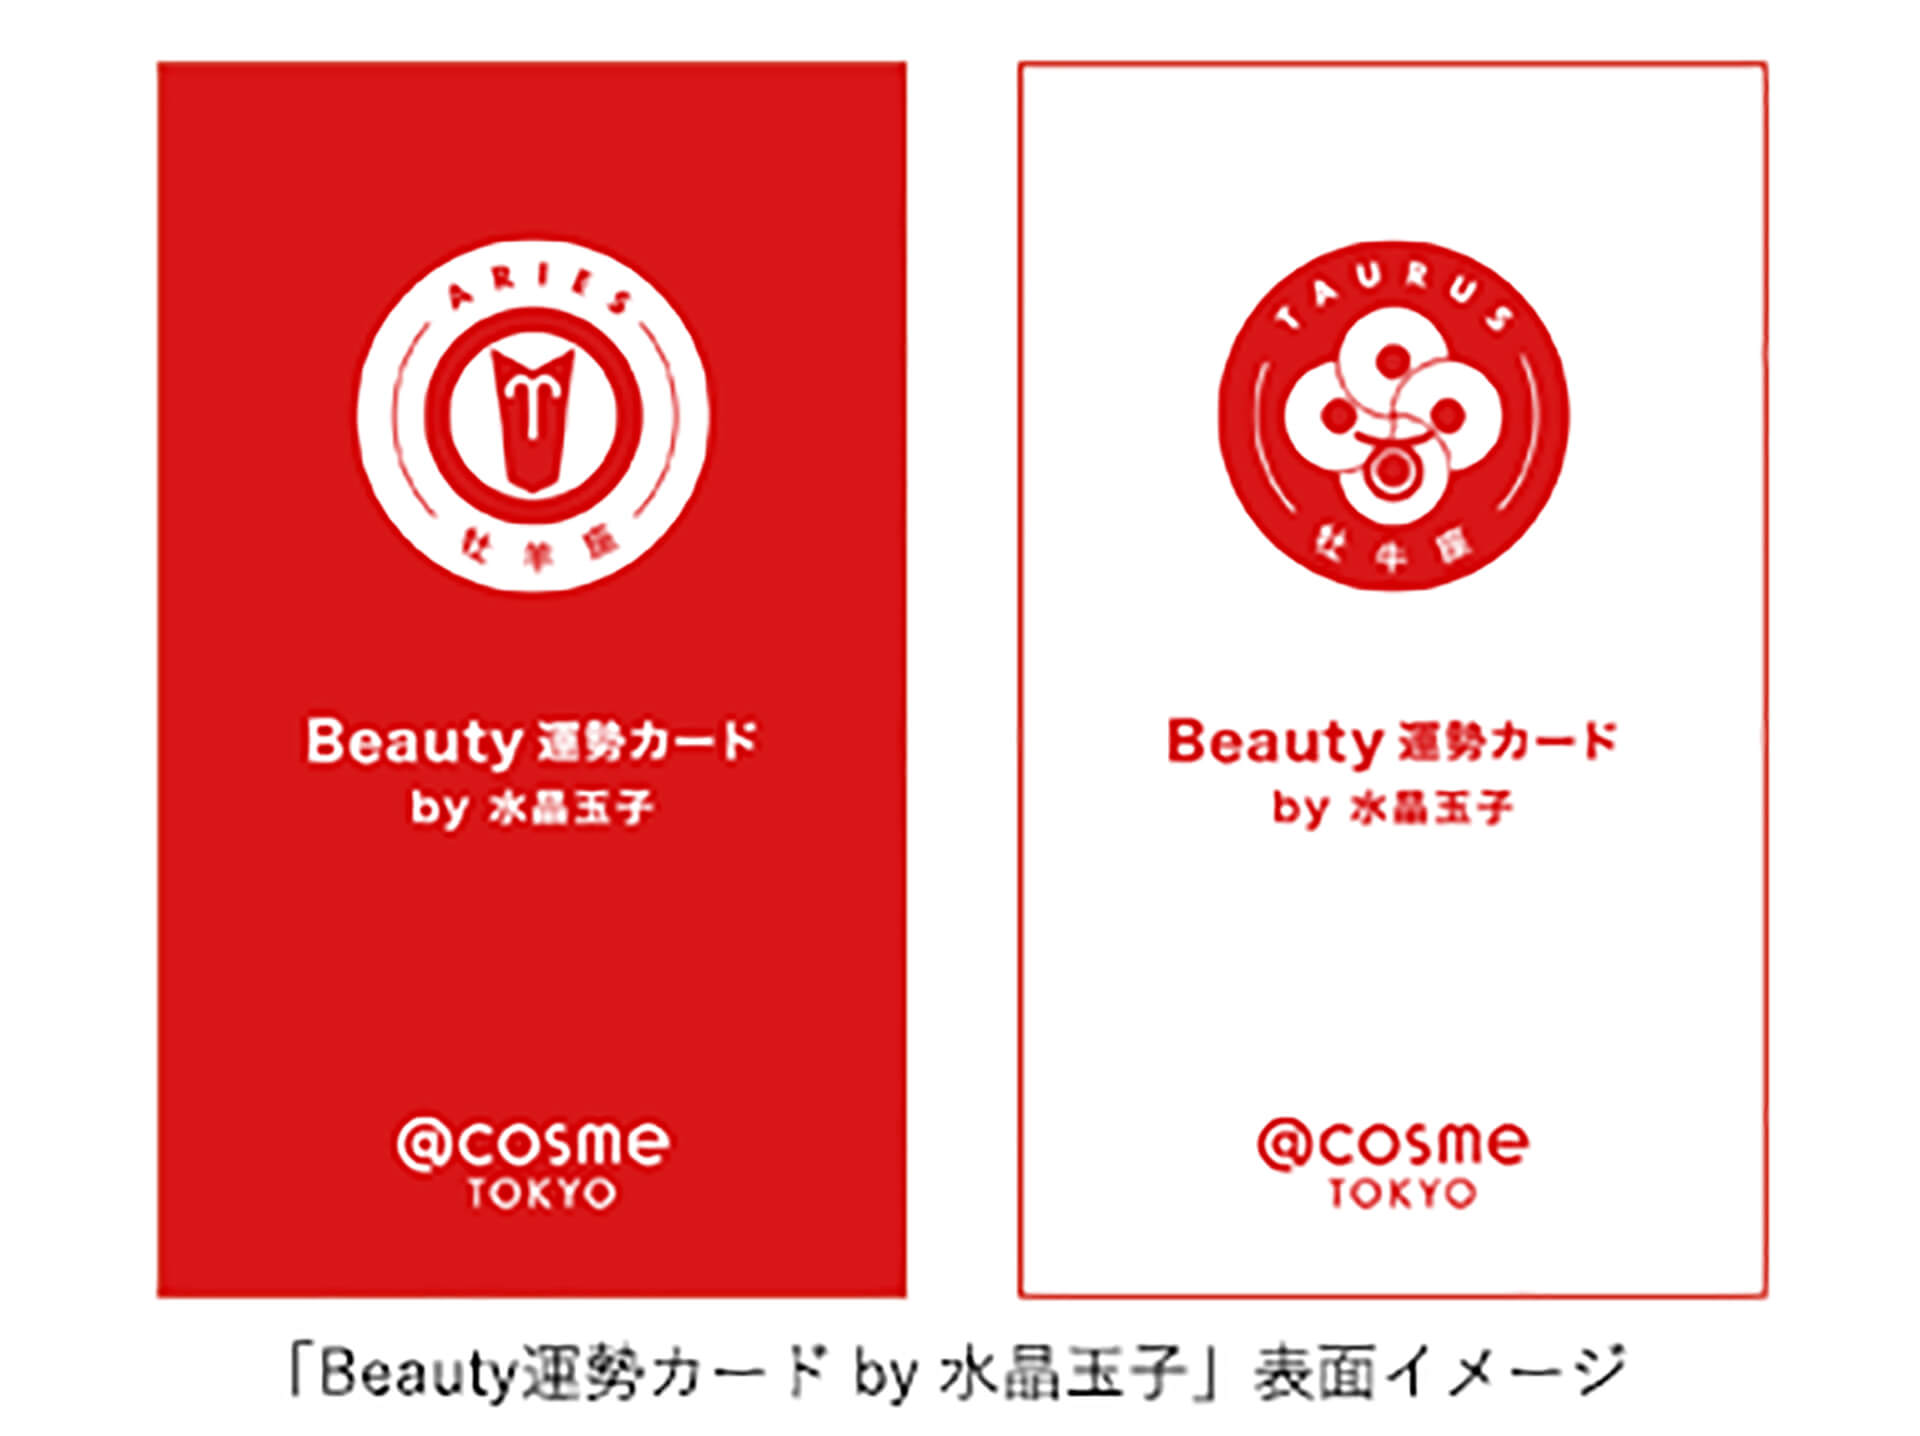 「@cosme TOKYO」オープン1周年記念・新春アニバーサリーイベント